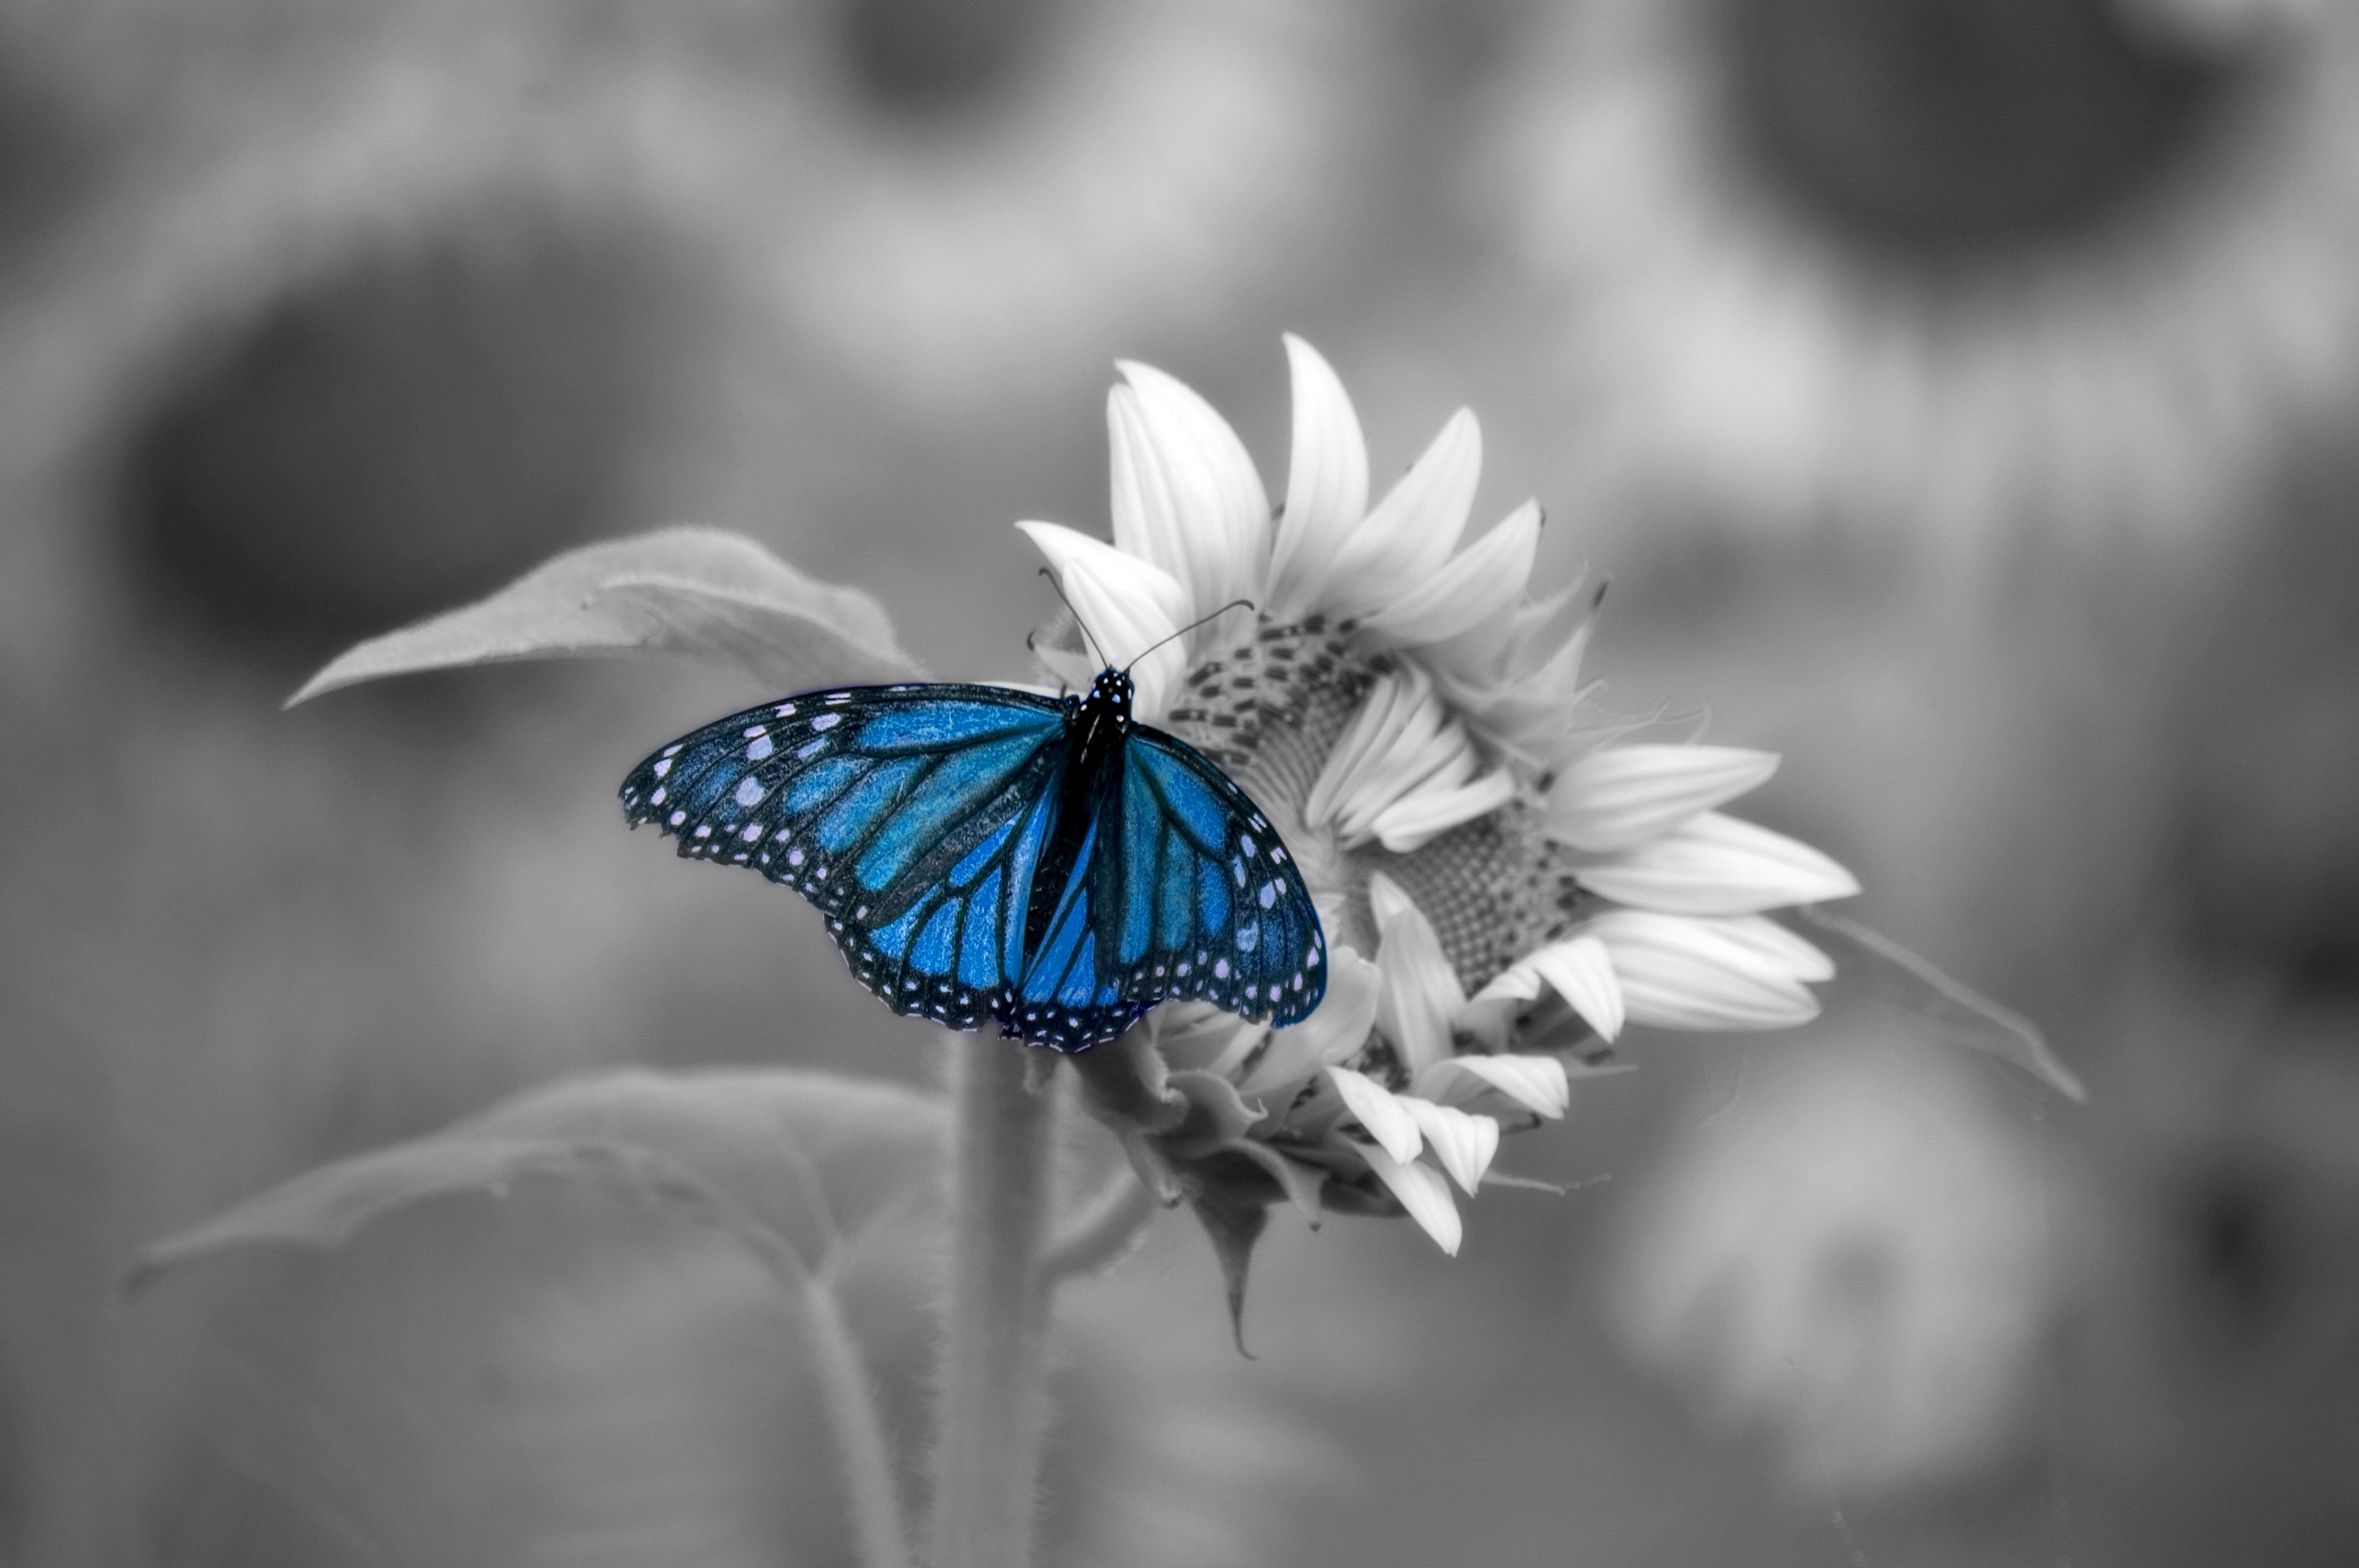 blue butterfly 5k retina ultra hd wallpaper and hintergrund 6016x4000 id 771616. Black Bedroom Furniture Sets. Home Design Ideas